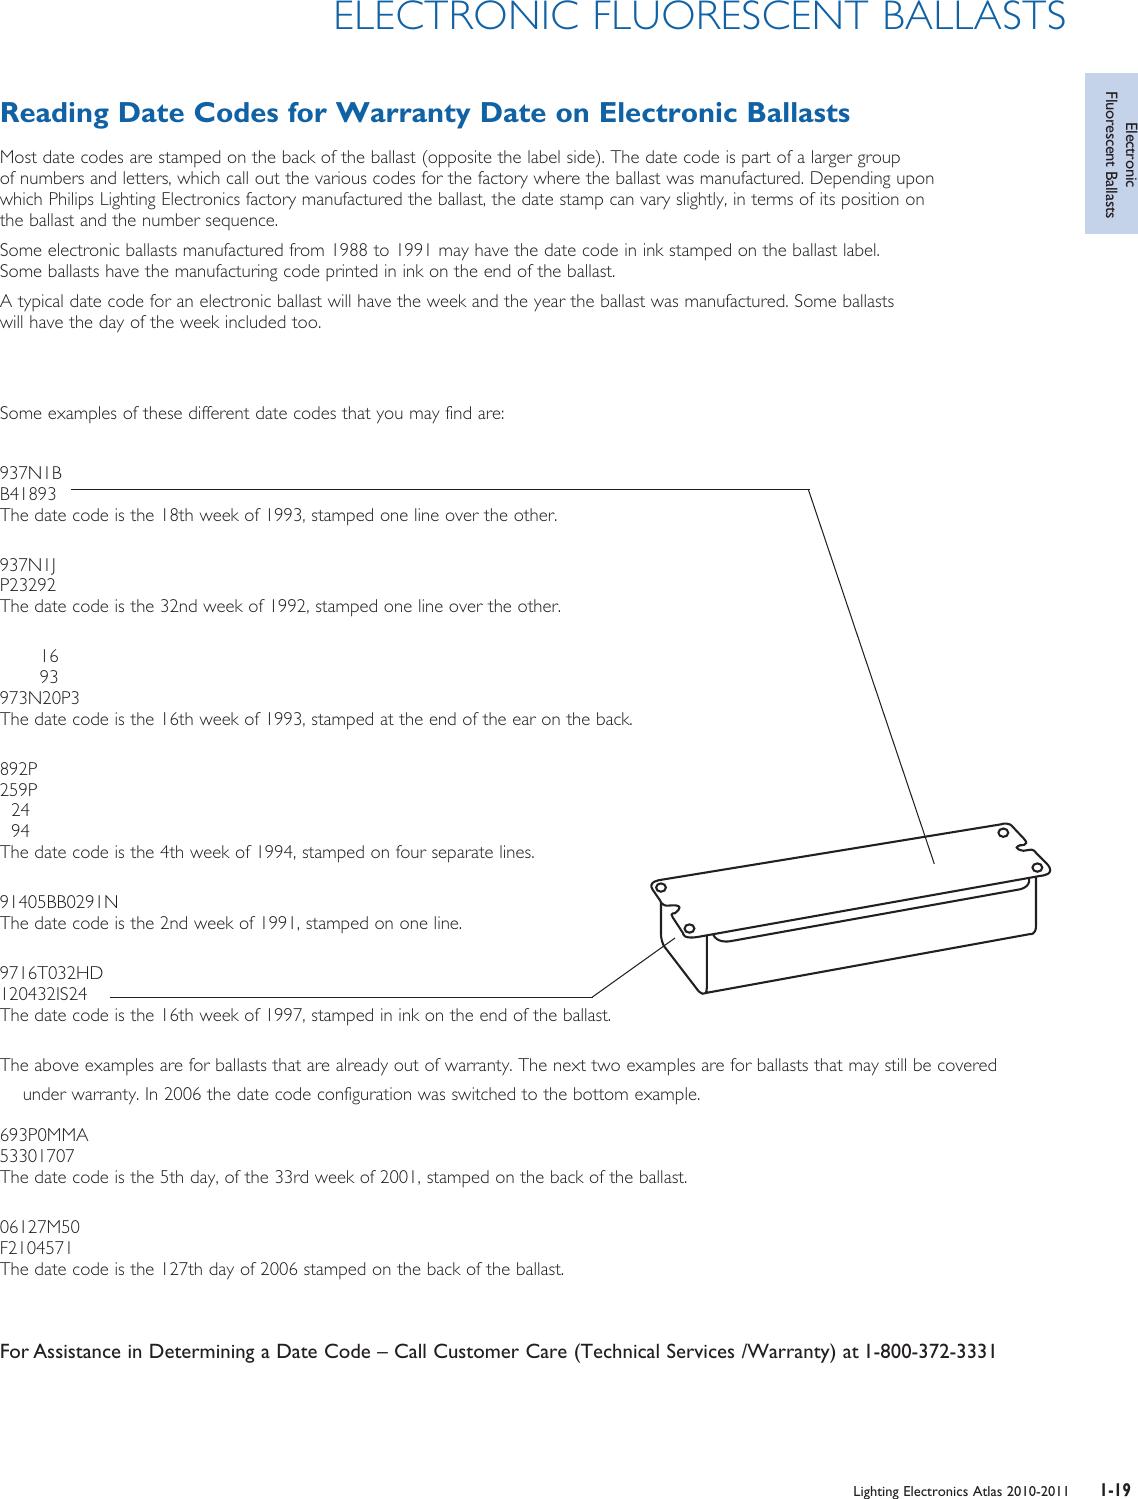 toe 3 x 14//4 x 14 w, Electronic ballast ballast t5 3 x électron